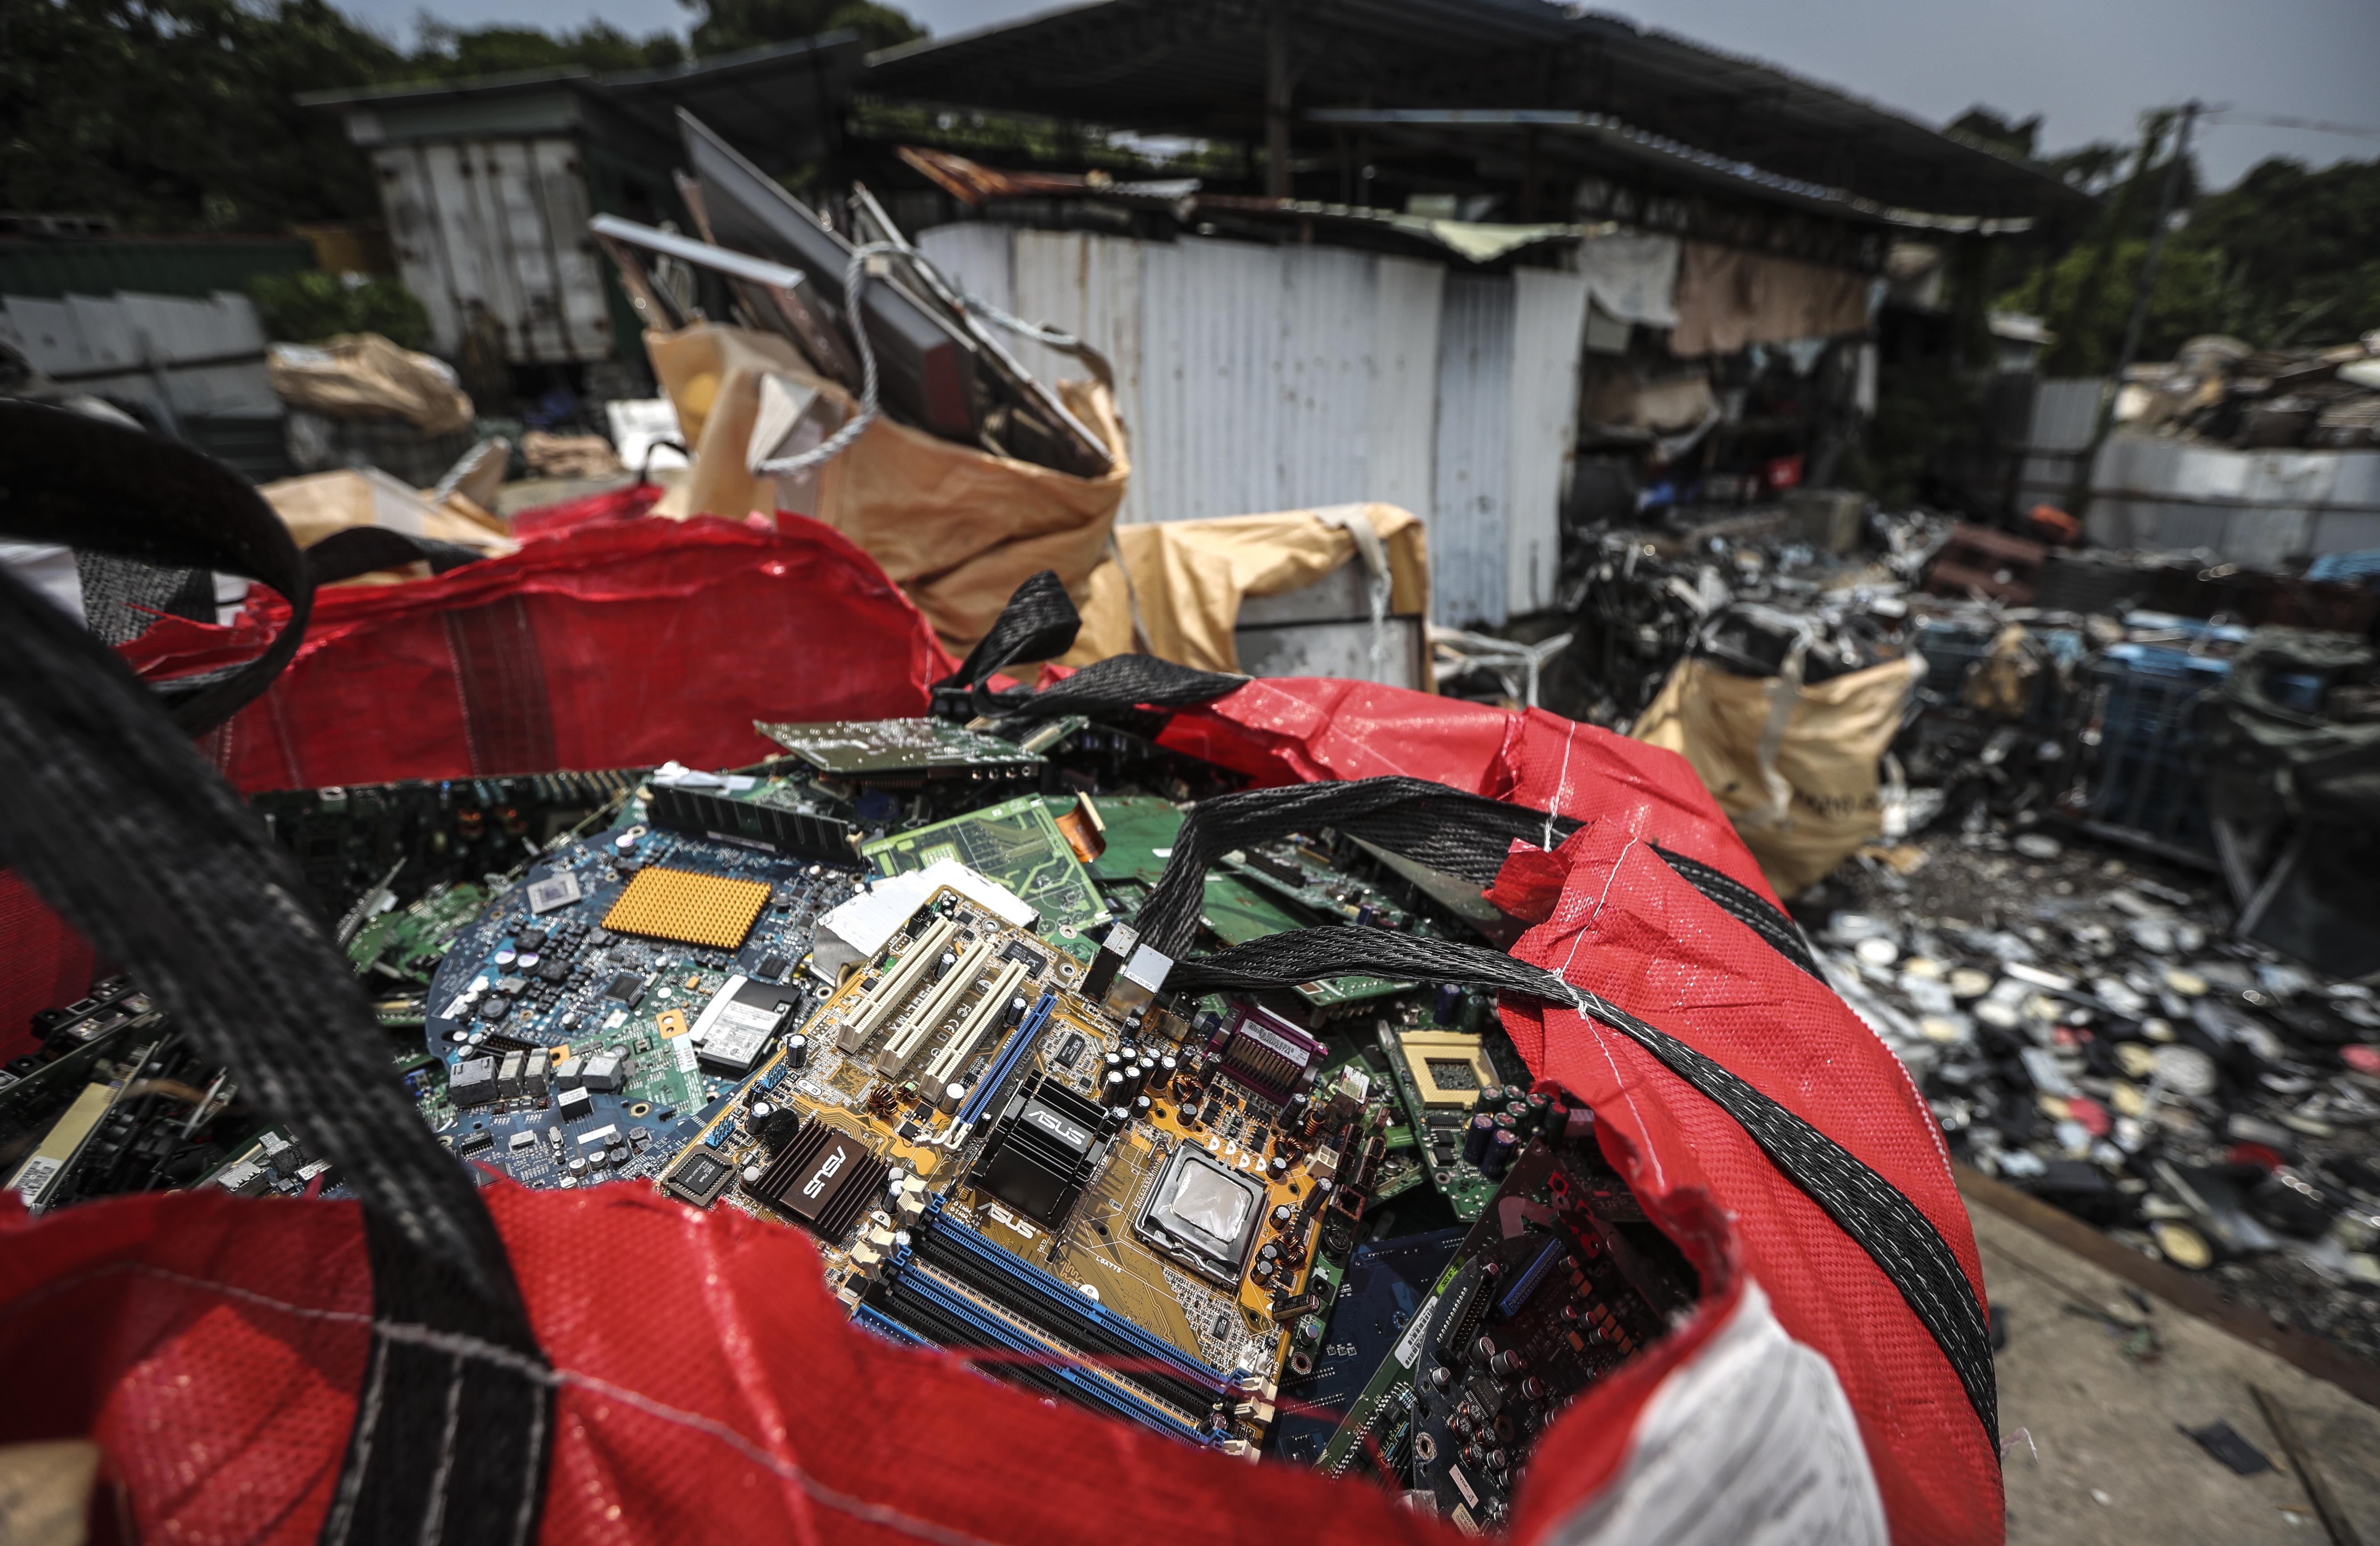 Illegal e-waste dumping grounds in Yuen Long. [No. 3] . 09JUL16 SCMP/ Bruce Yan